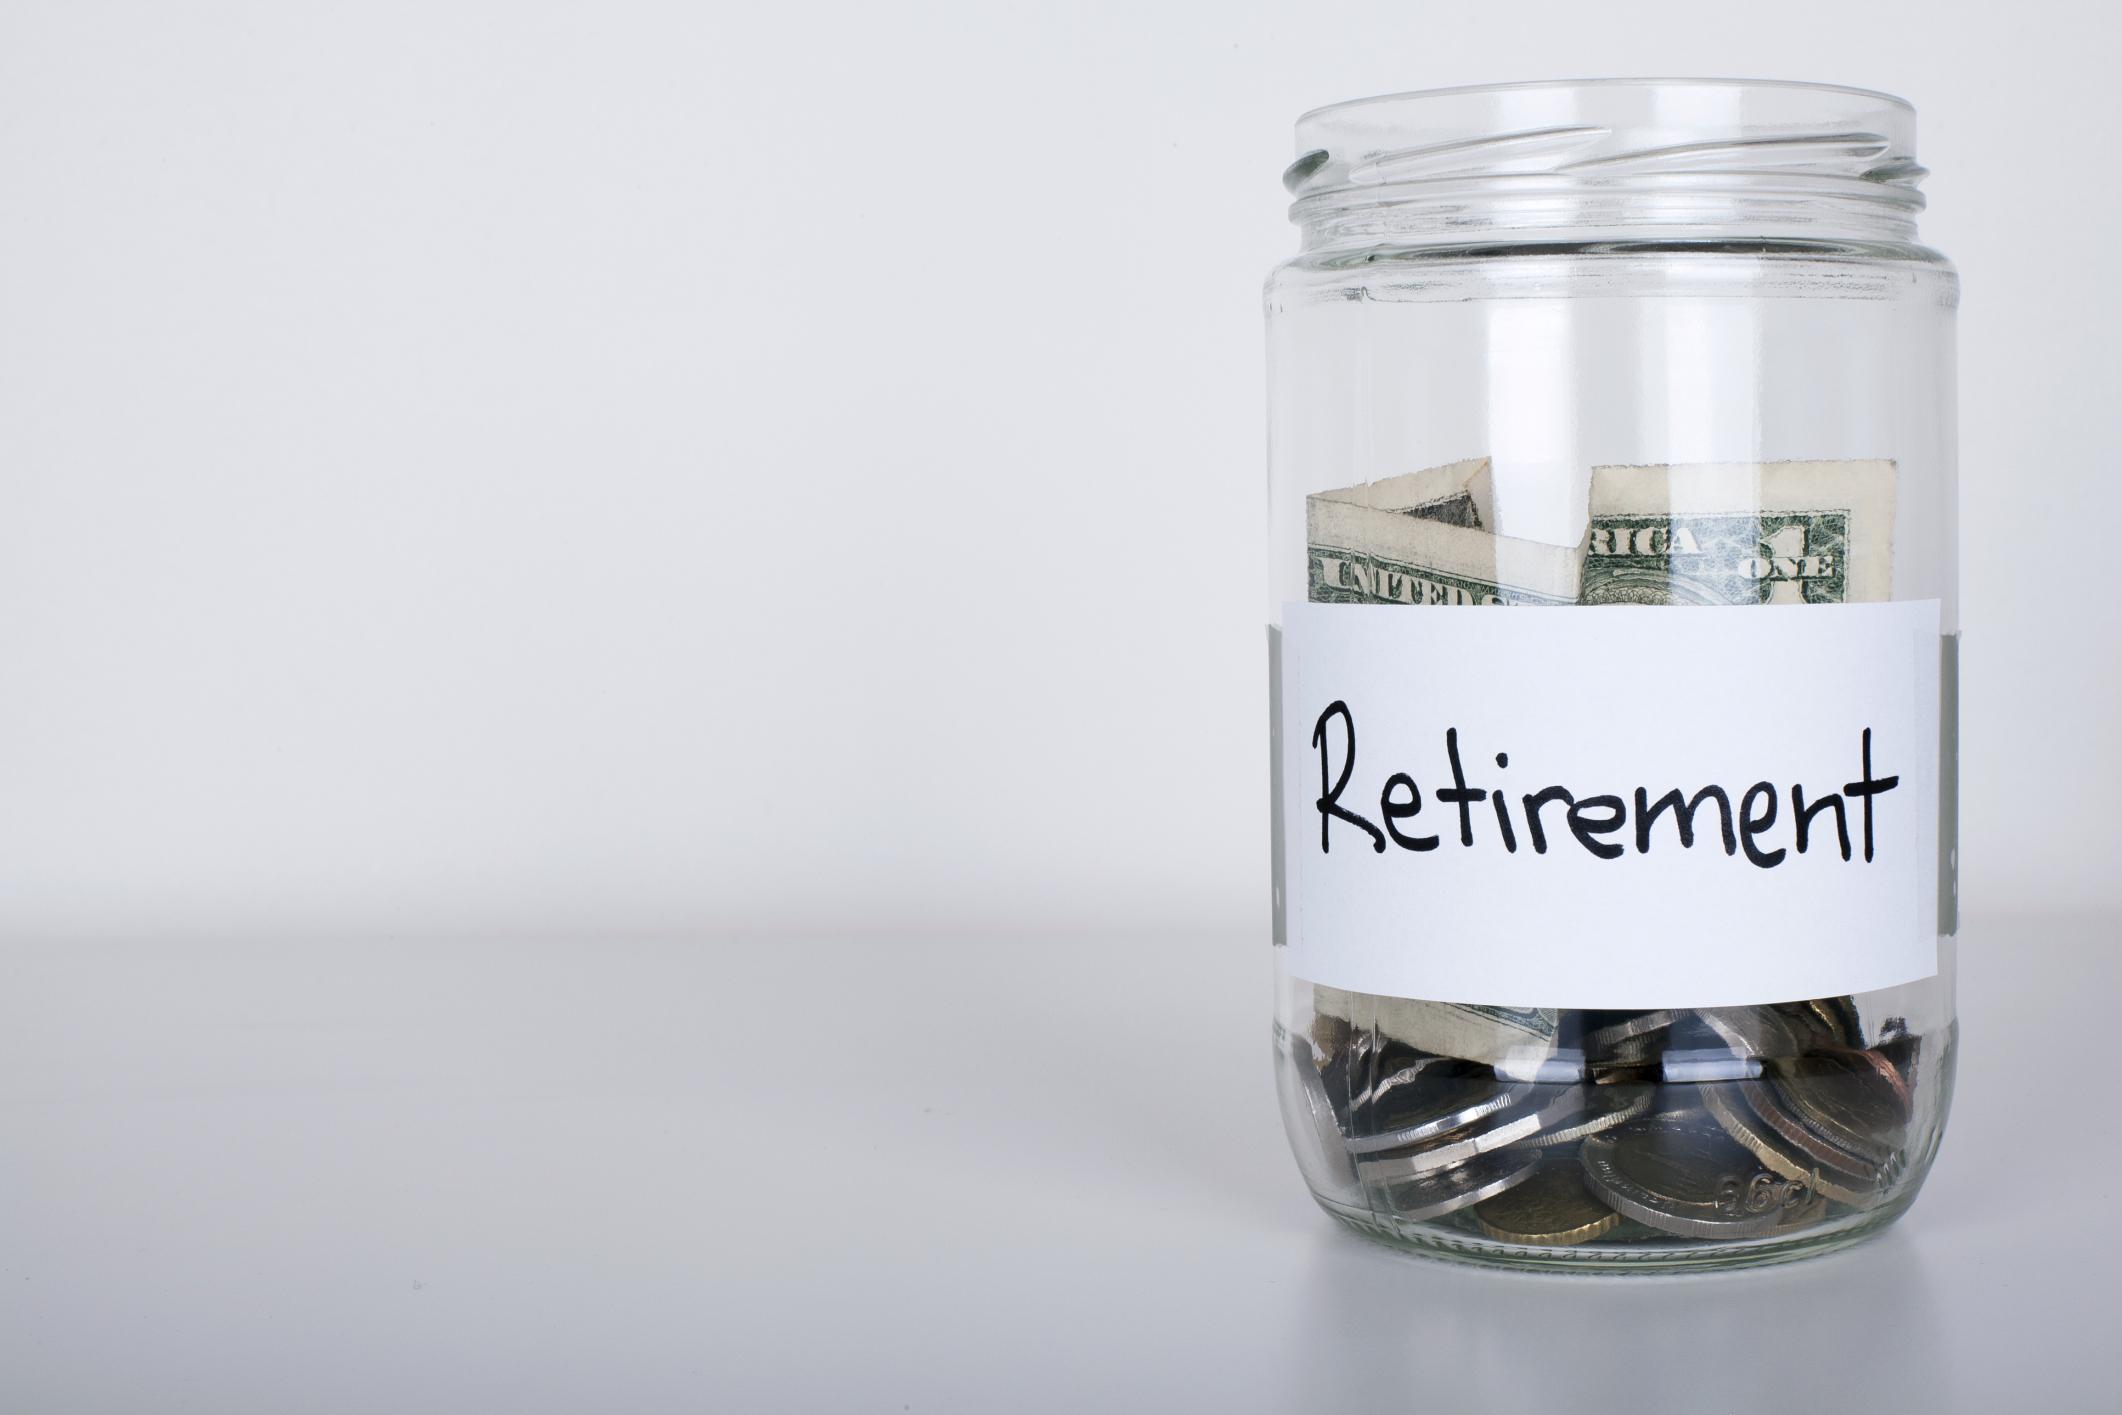 Jar of money labeled for retirement savings.